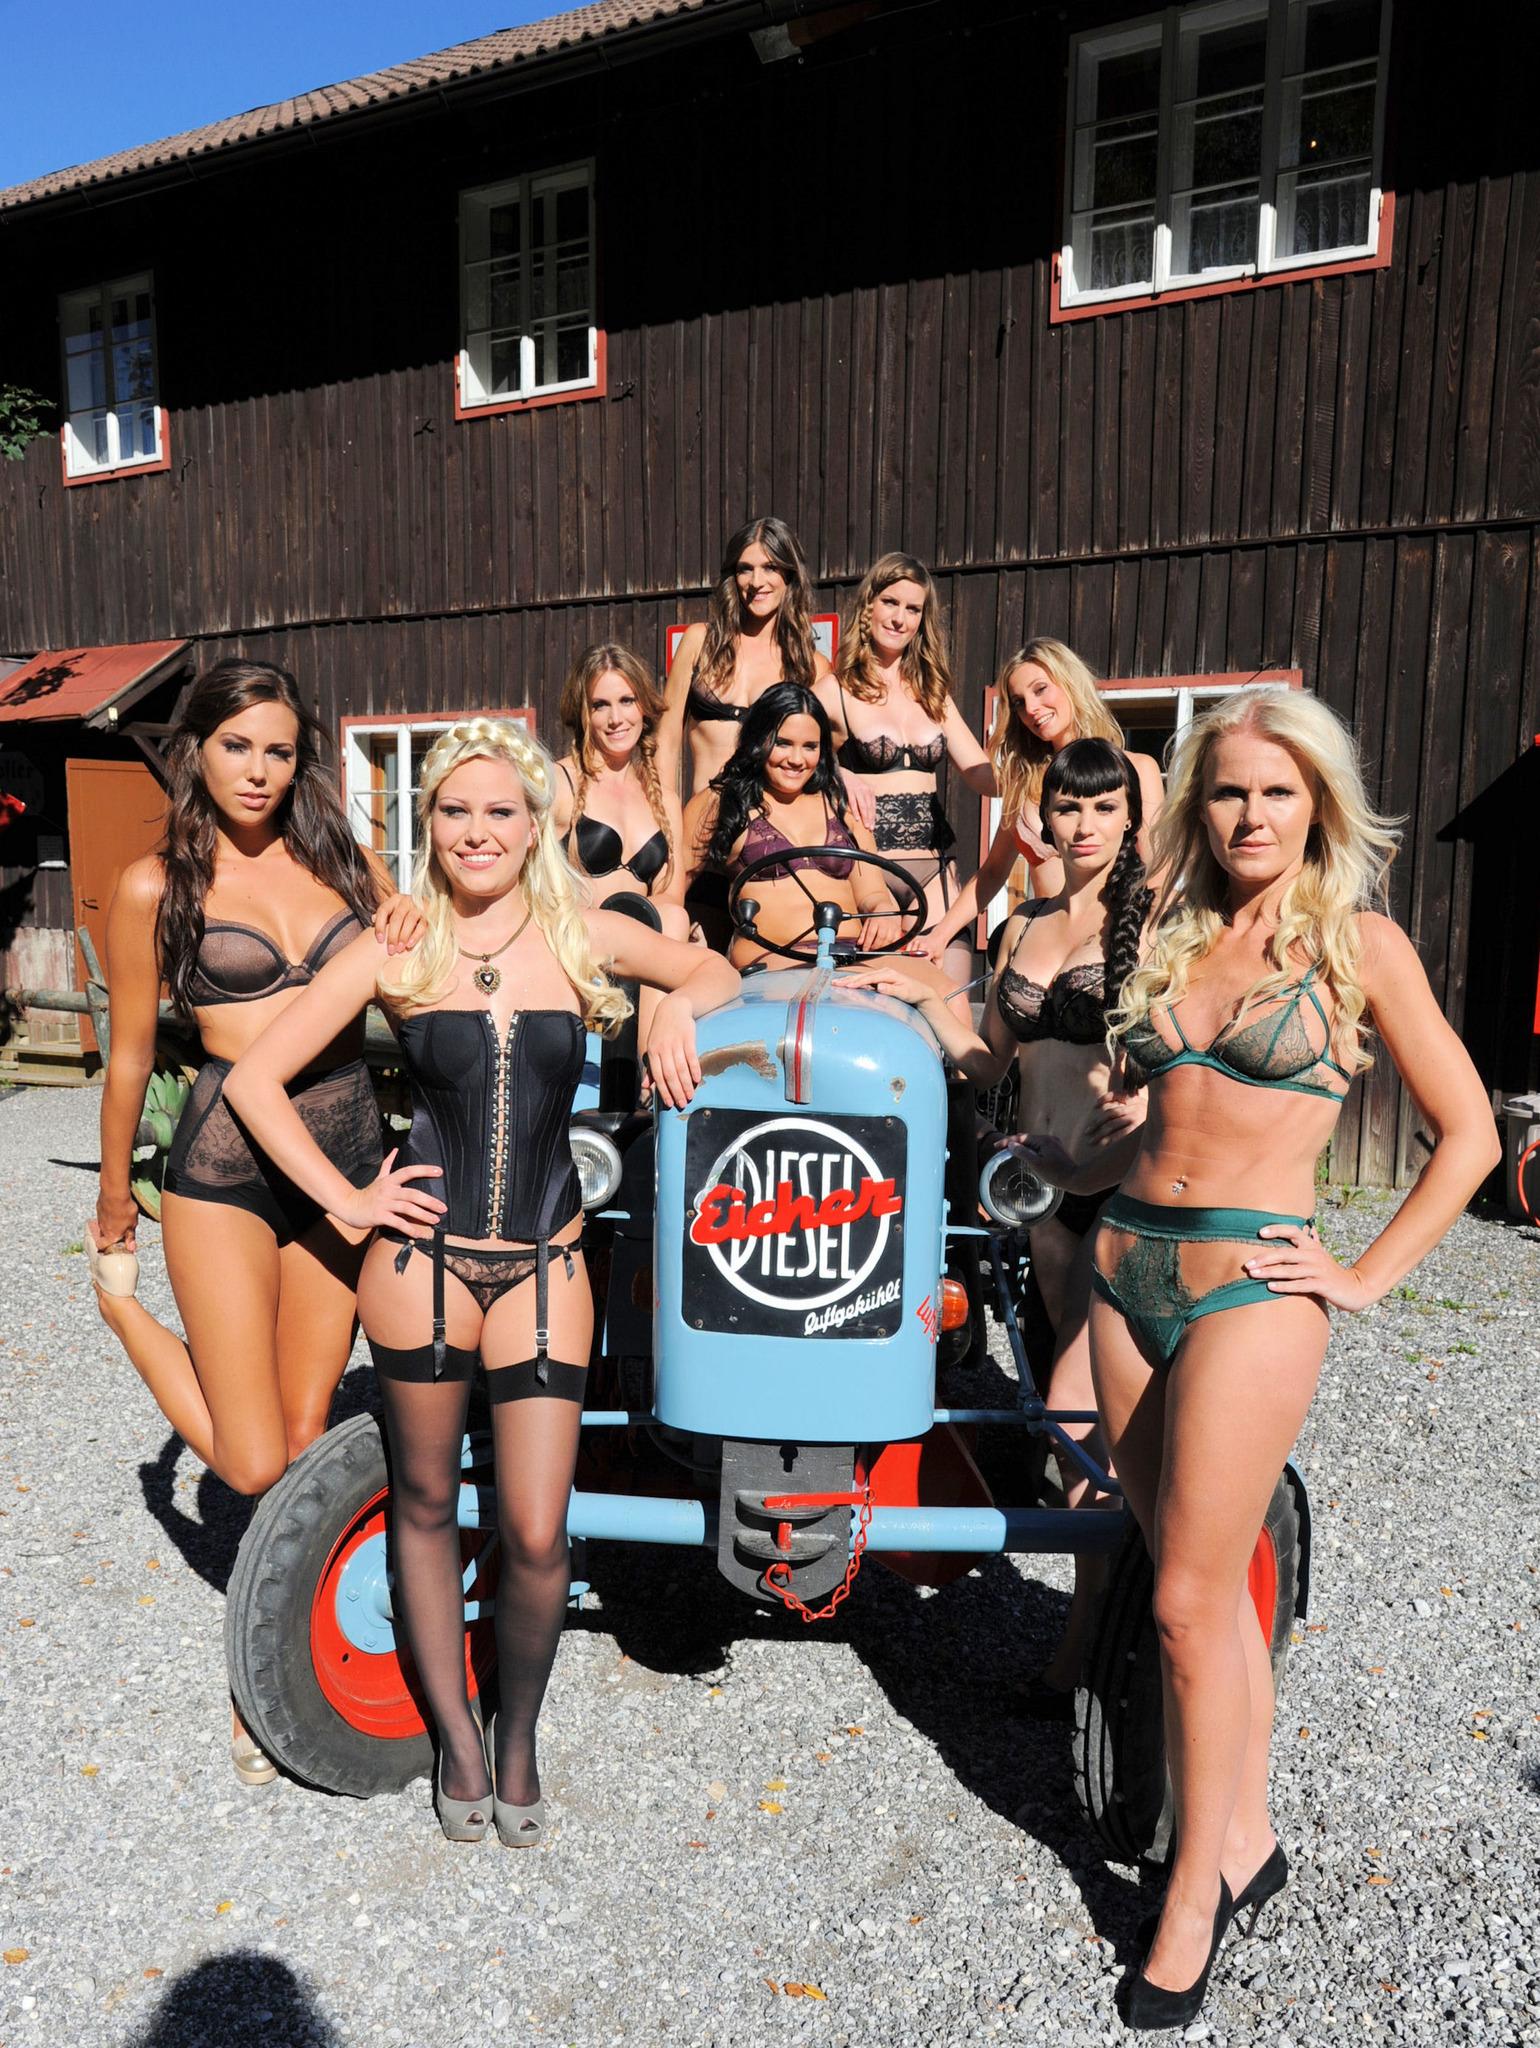 Playboy bäuerinnen